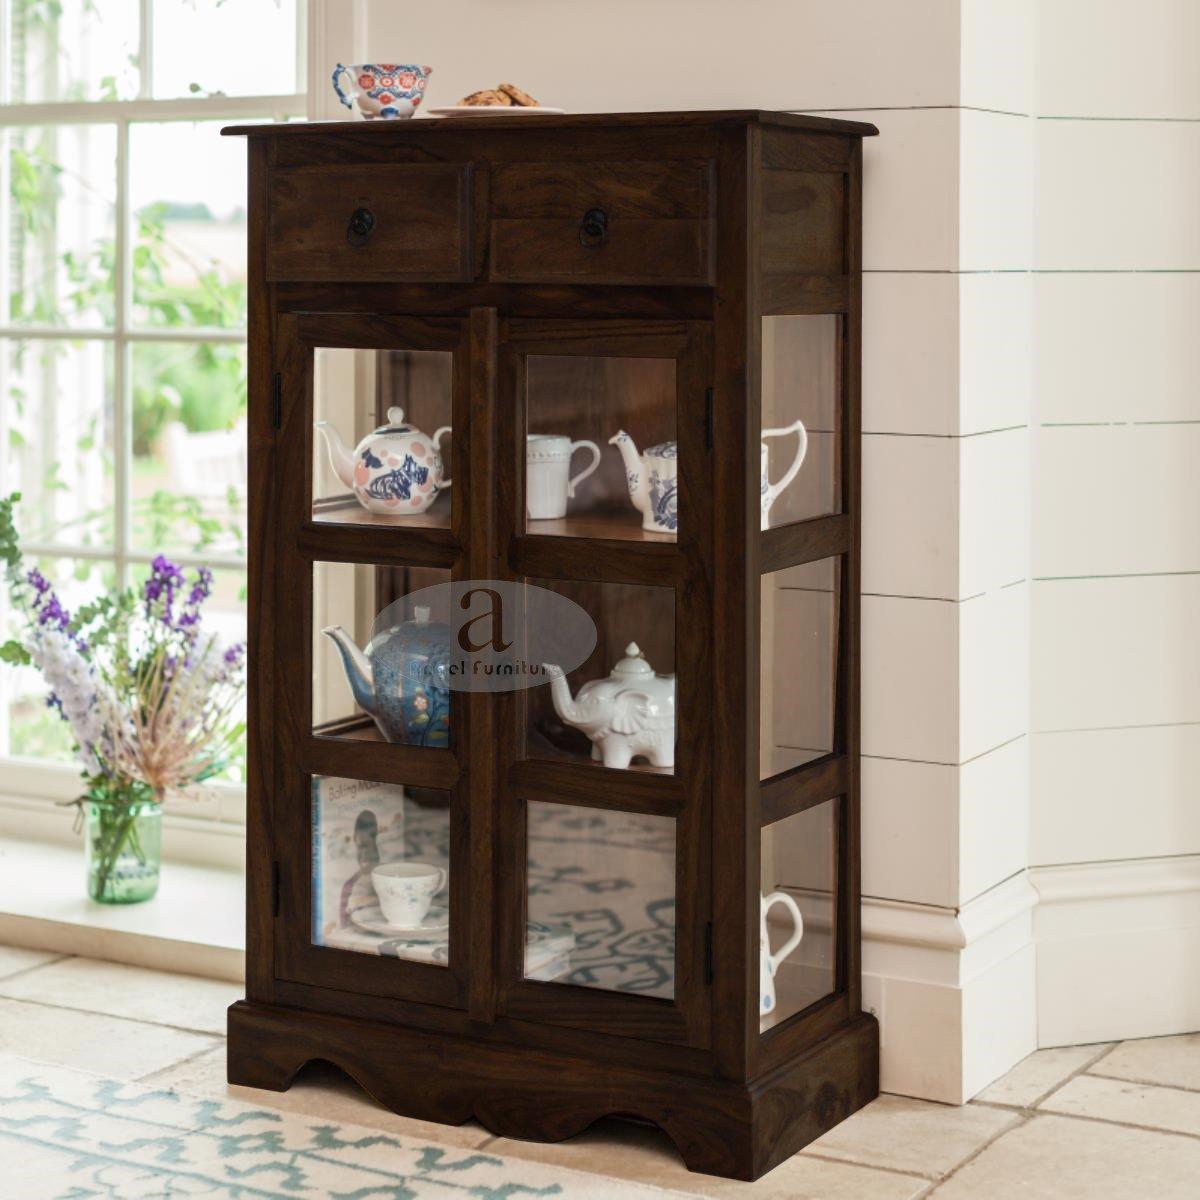 Angel S Solid Sheesham Kitchen Crockery Cabinet In Walnut Finish Amazon In Home Kitchen